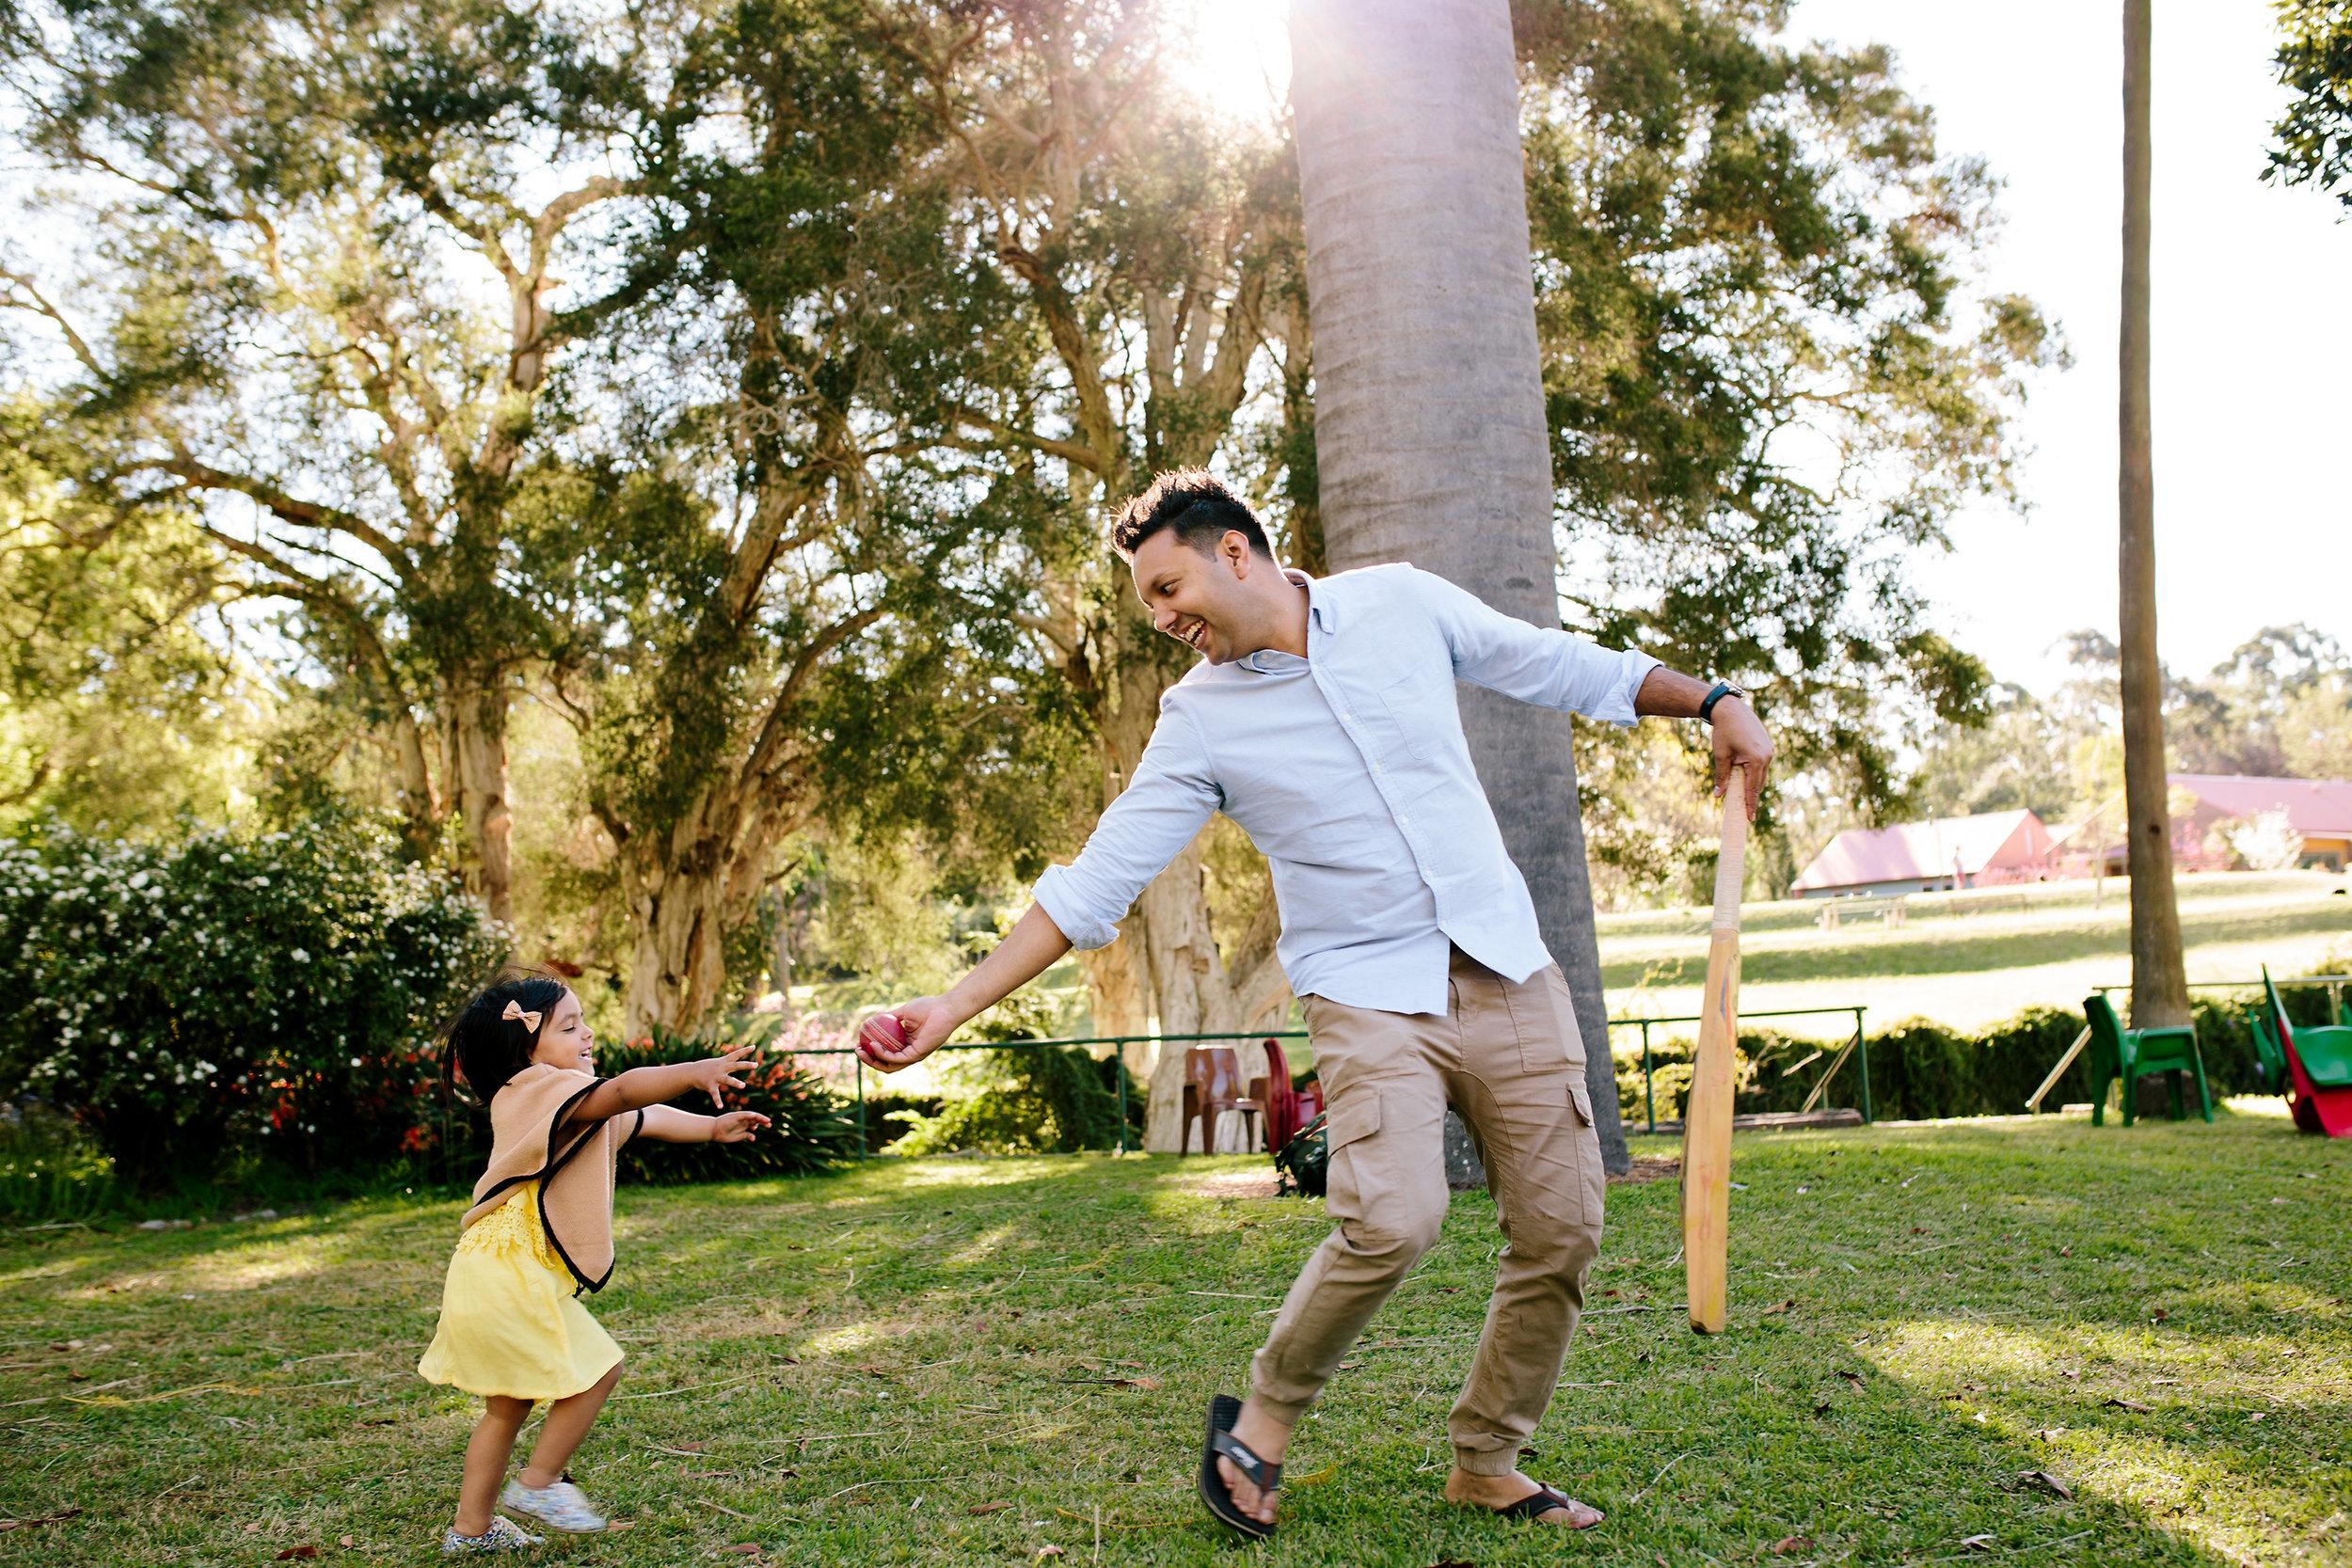 Dad teaching cricket